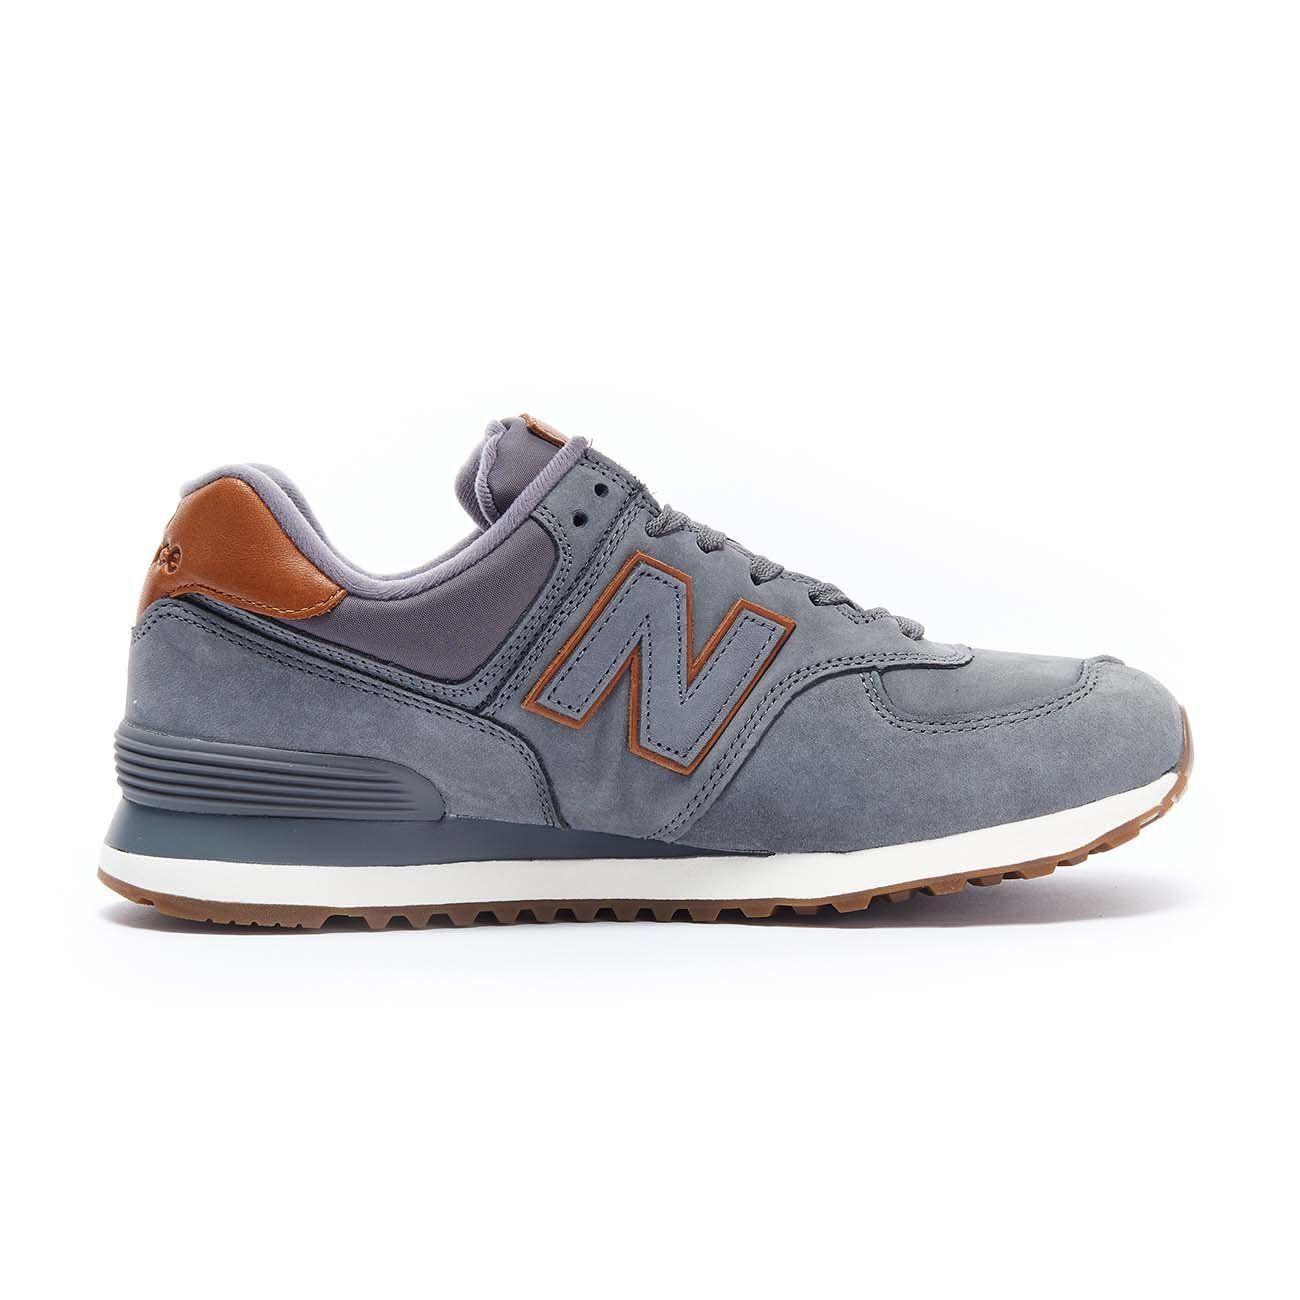 new balance 574 nubuck